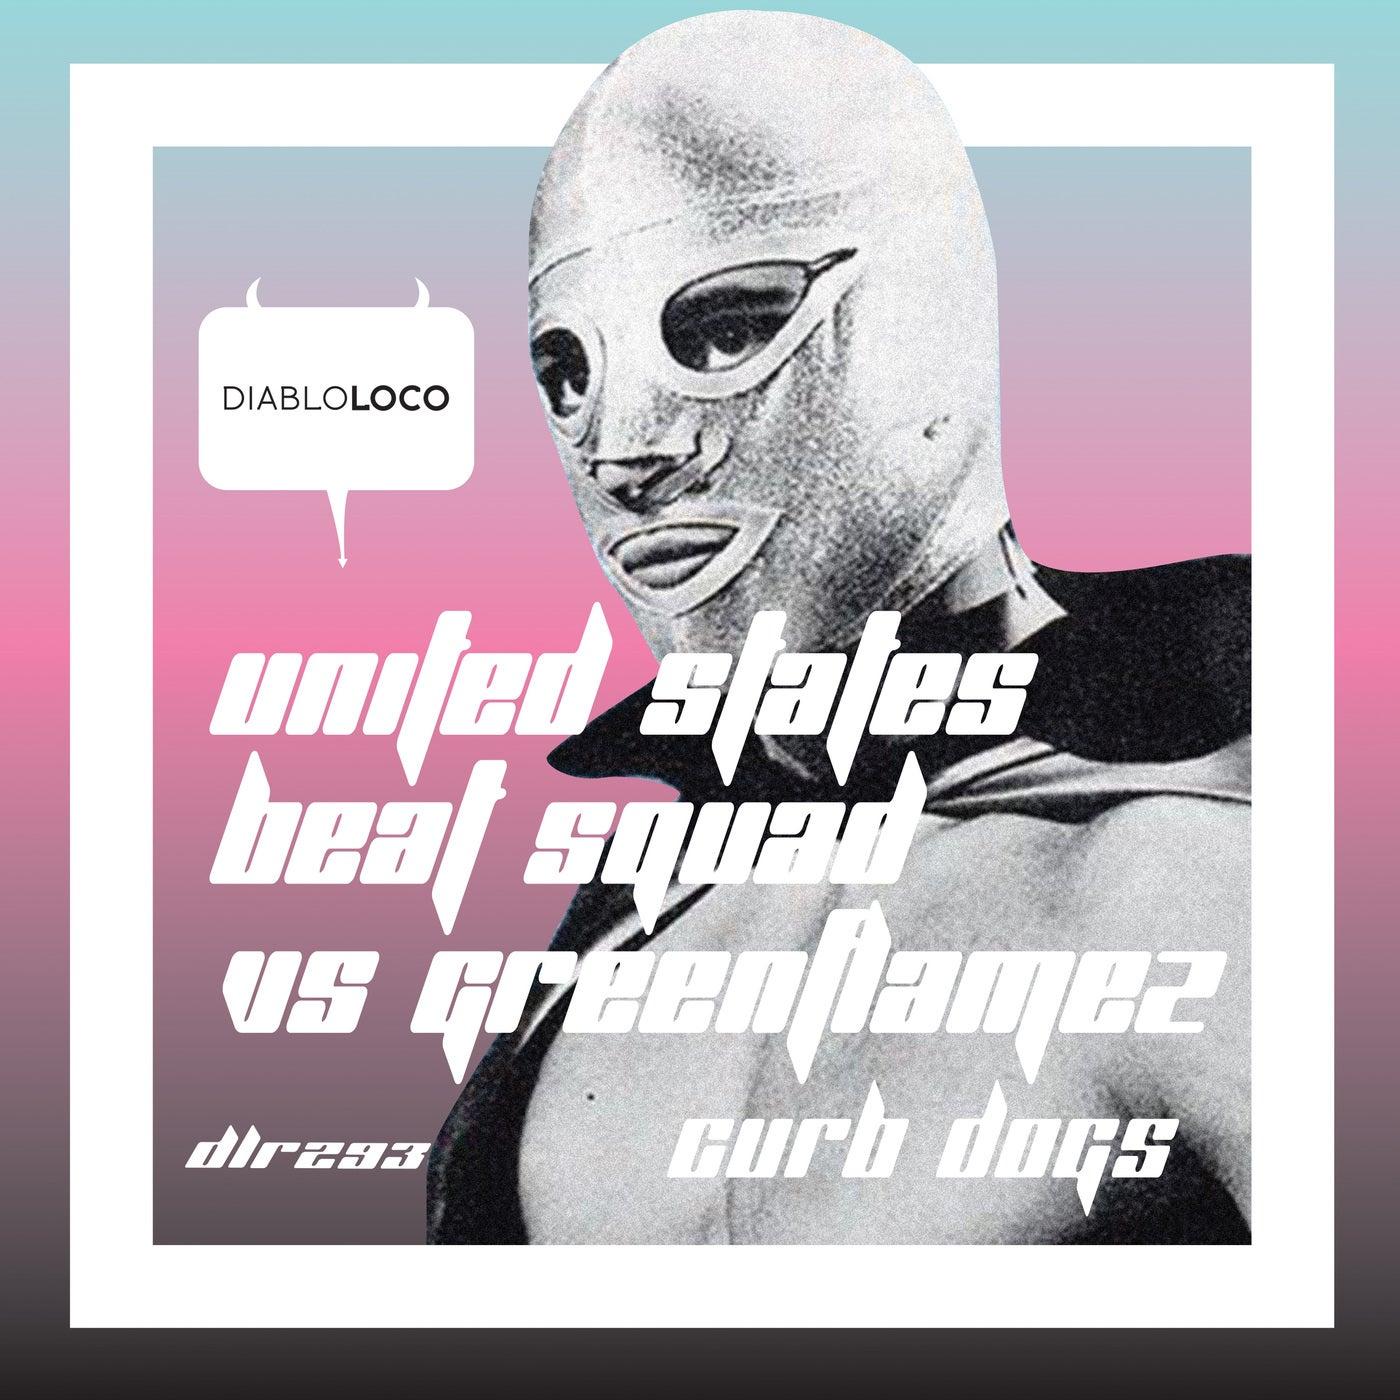 Curb Dogs (Original Mix)